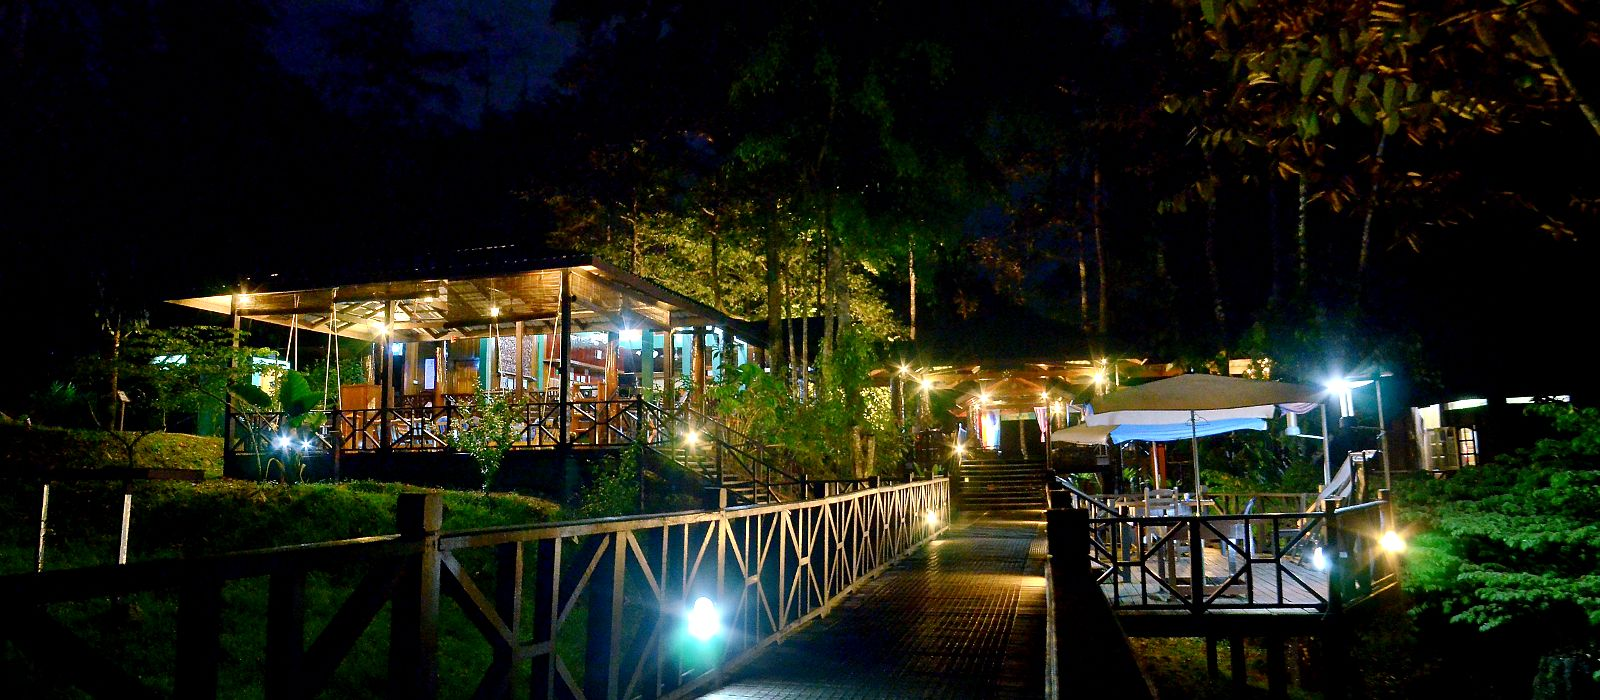 Reiseziel Tabin Wildreservat Malaysia